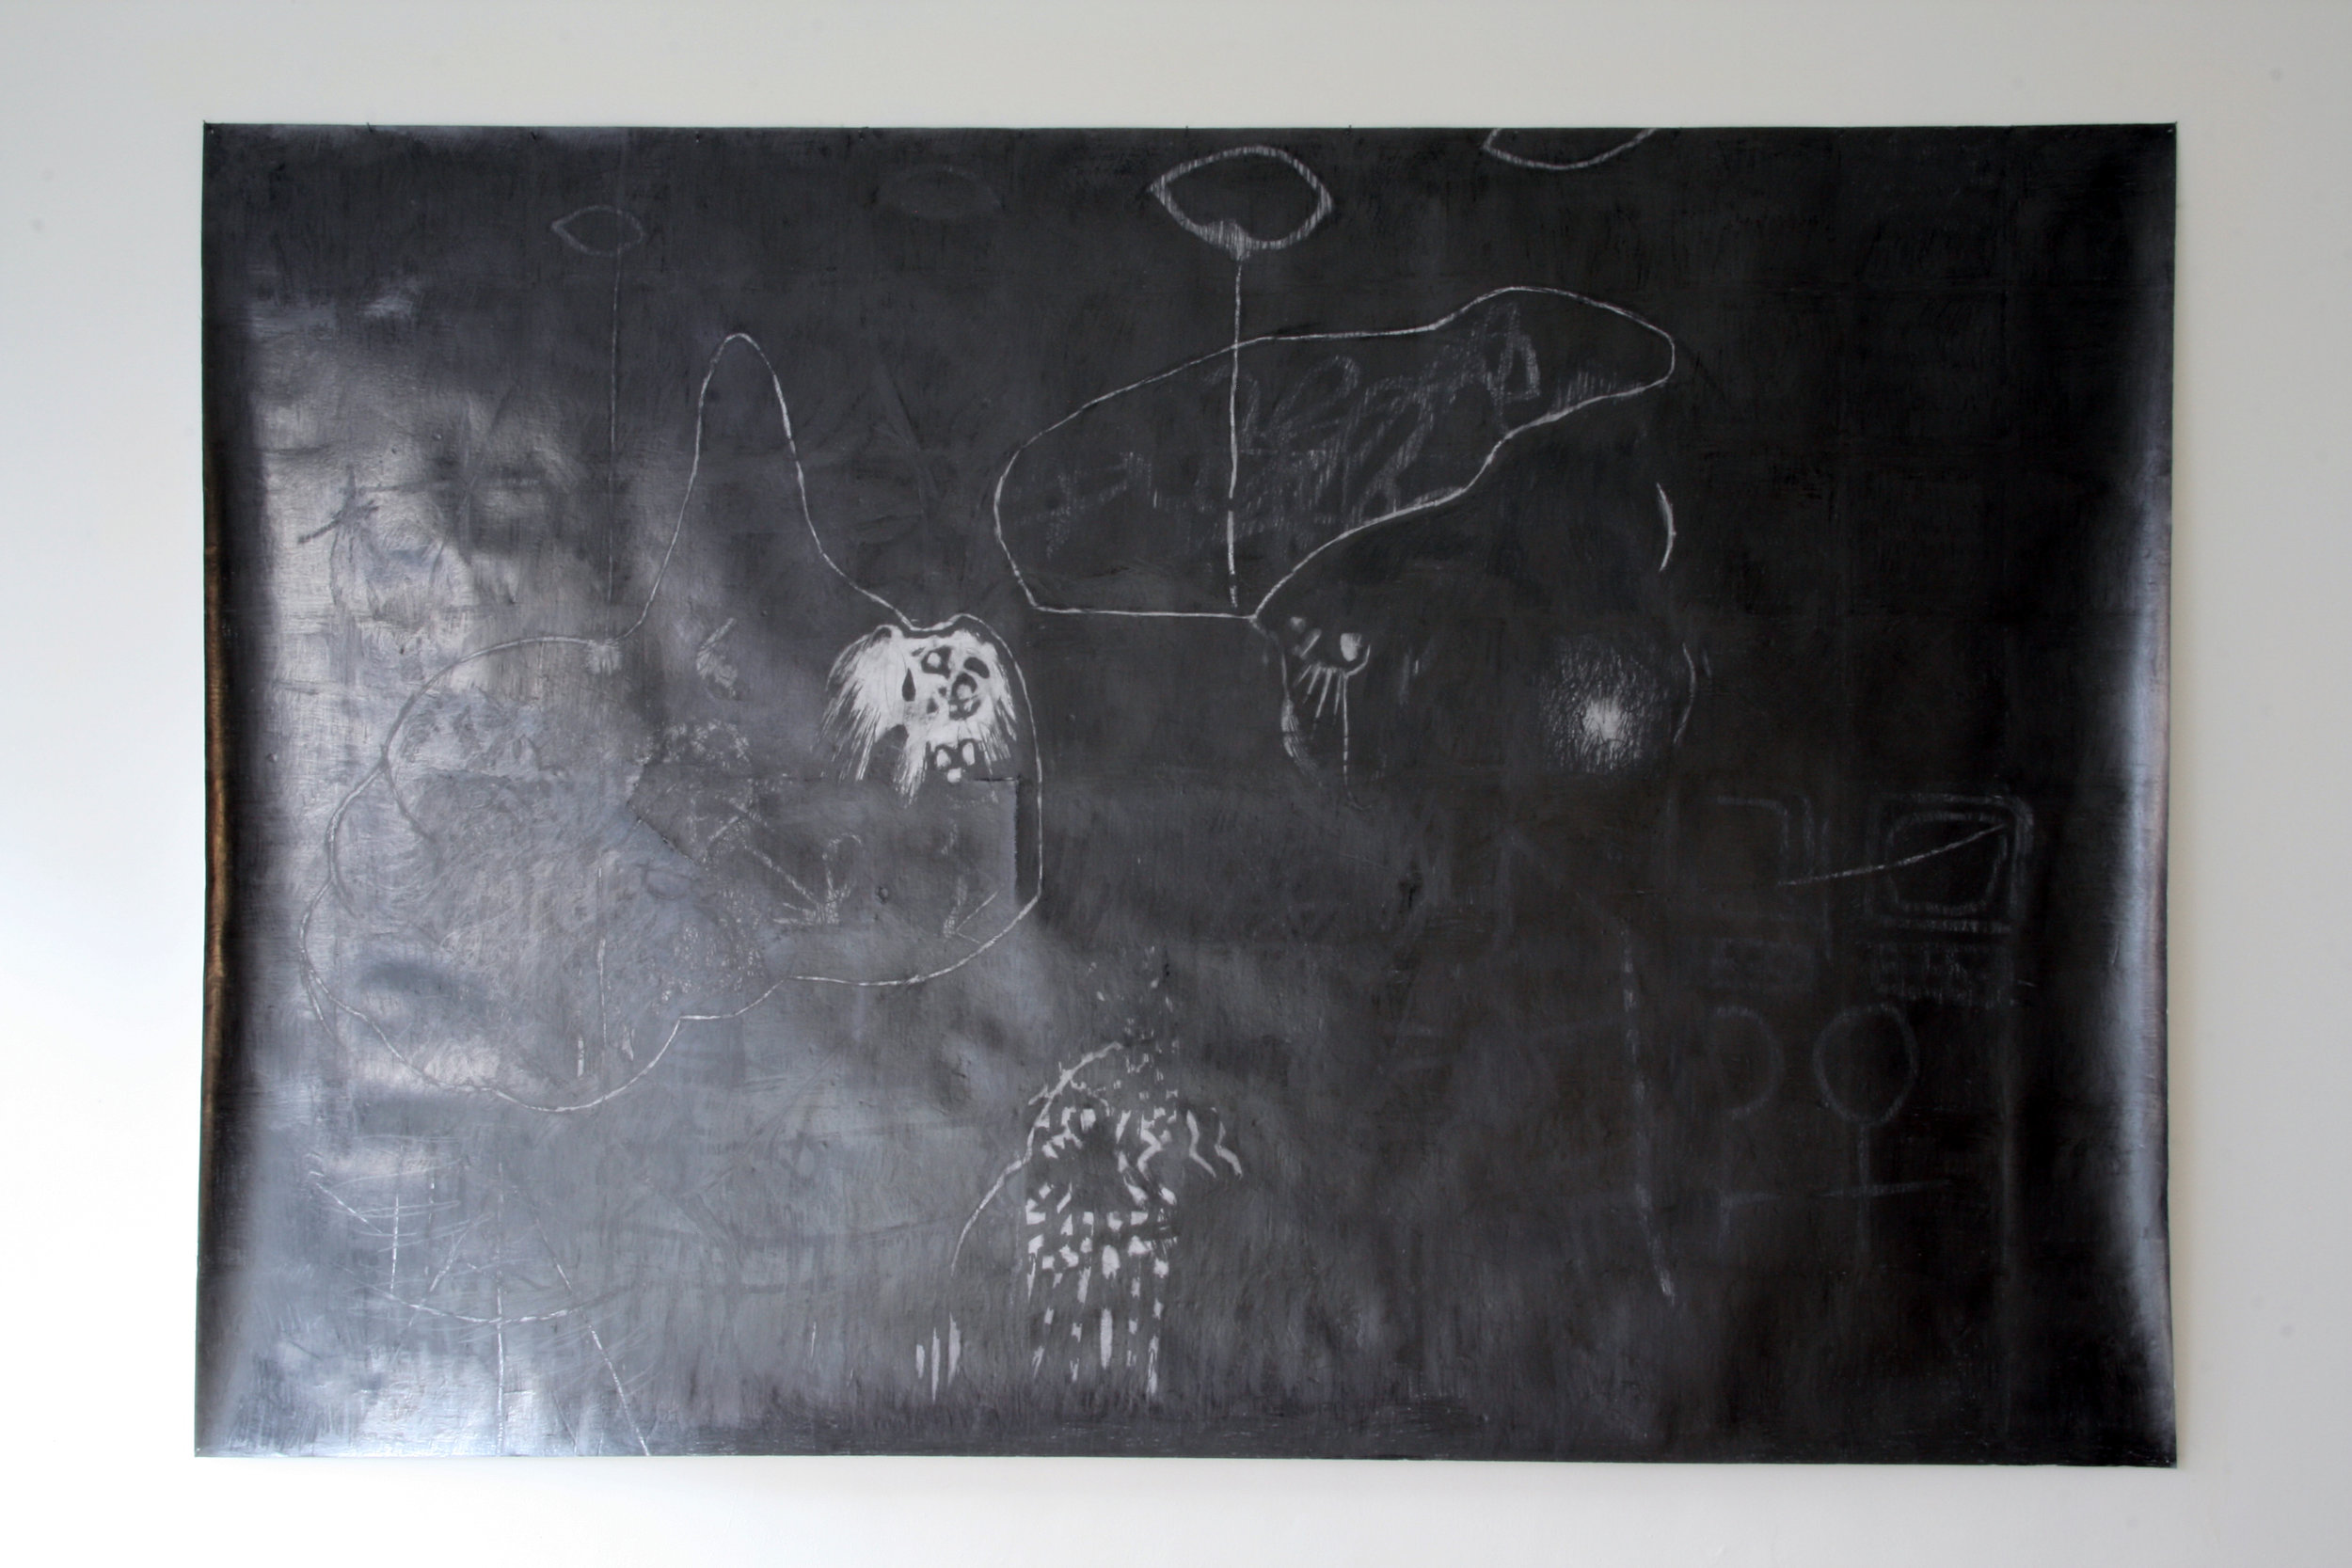 O.T. ( ylmz gtter ), 2008  Bleistift auf Papier, 200x300cm